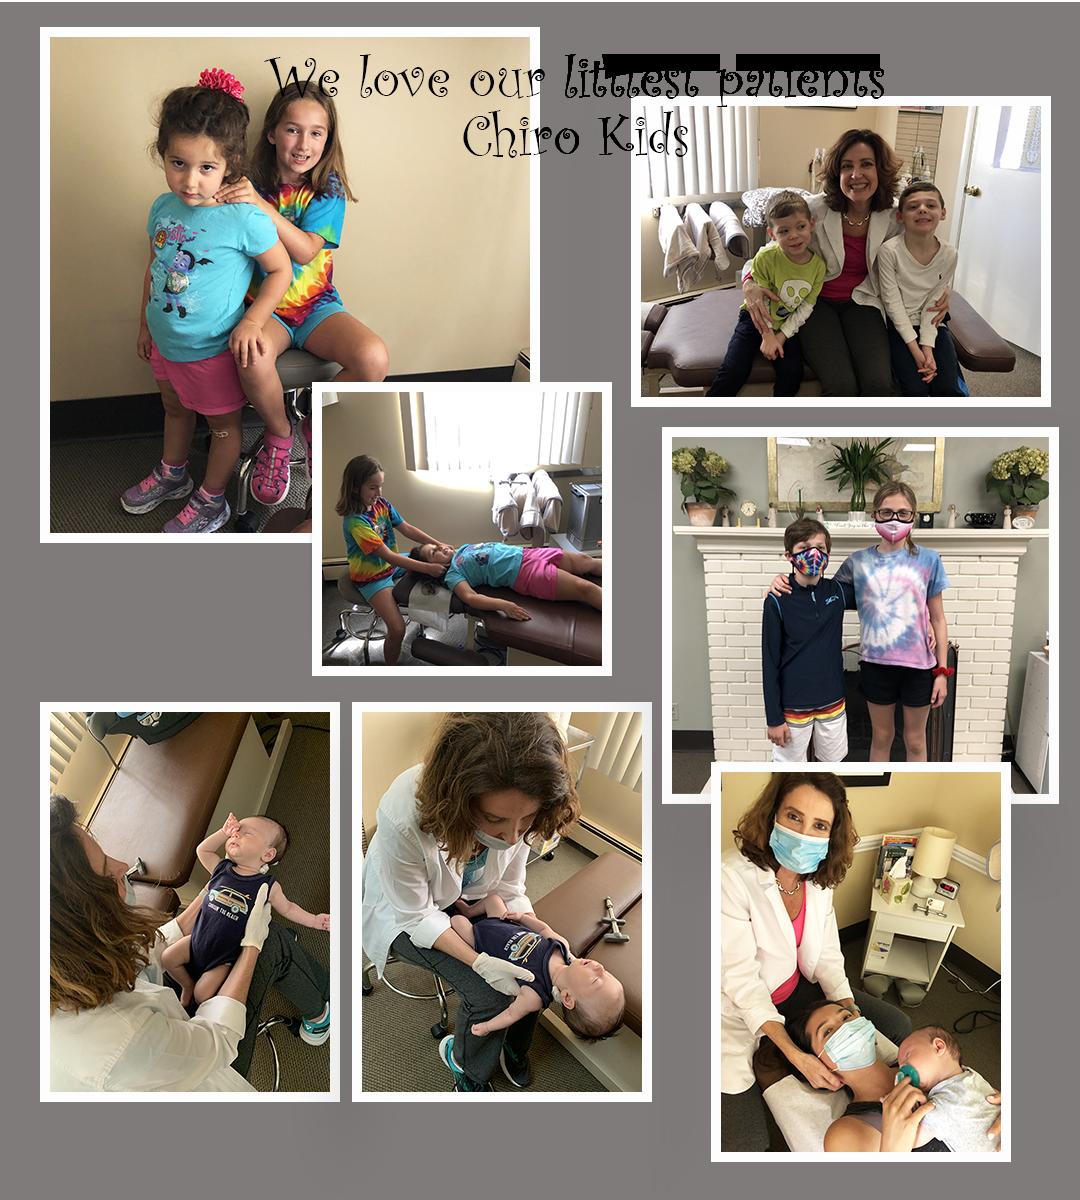 Chiro Kids - Chiropractic Services for Children